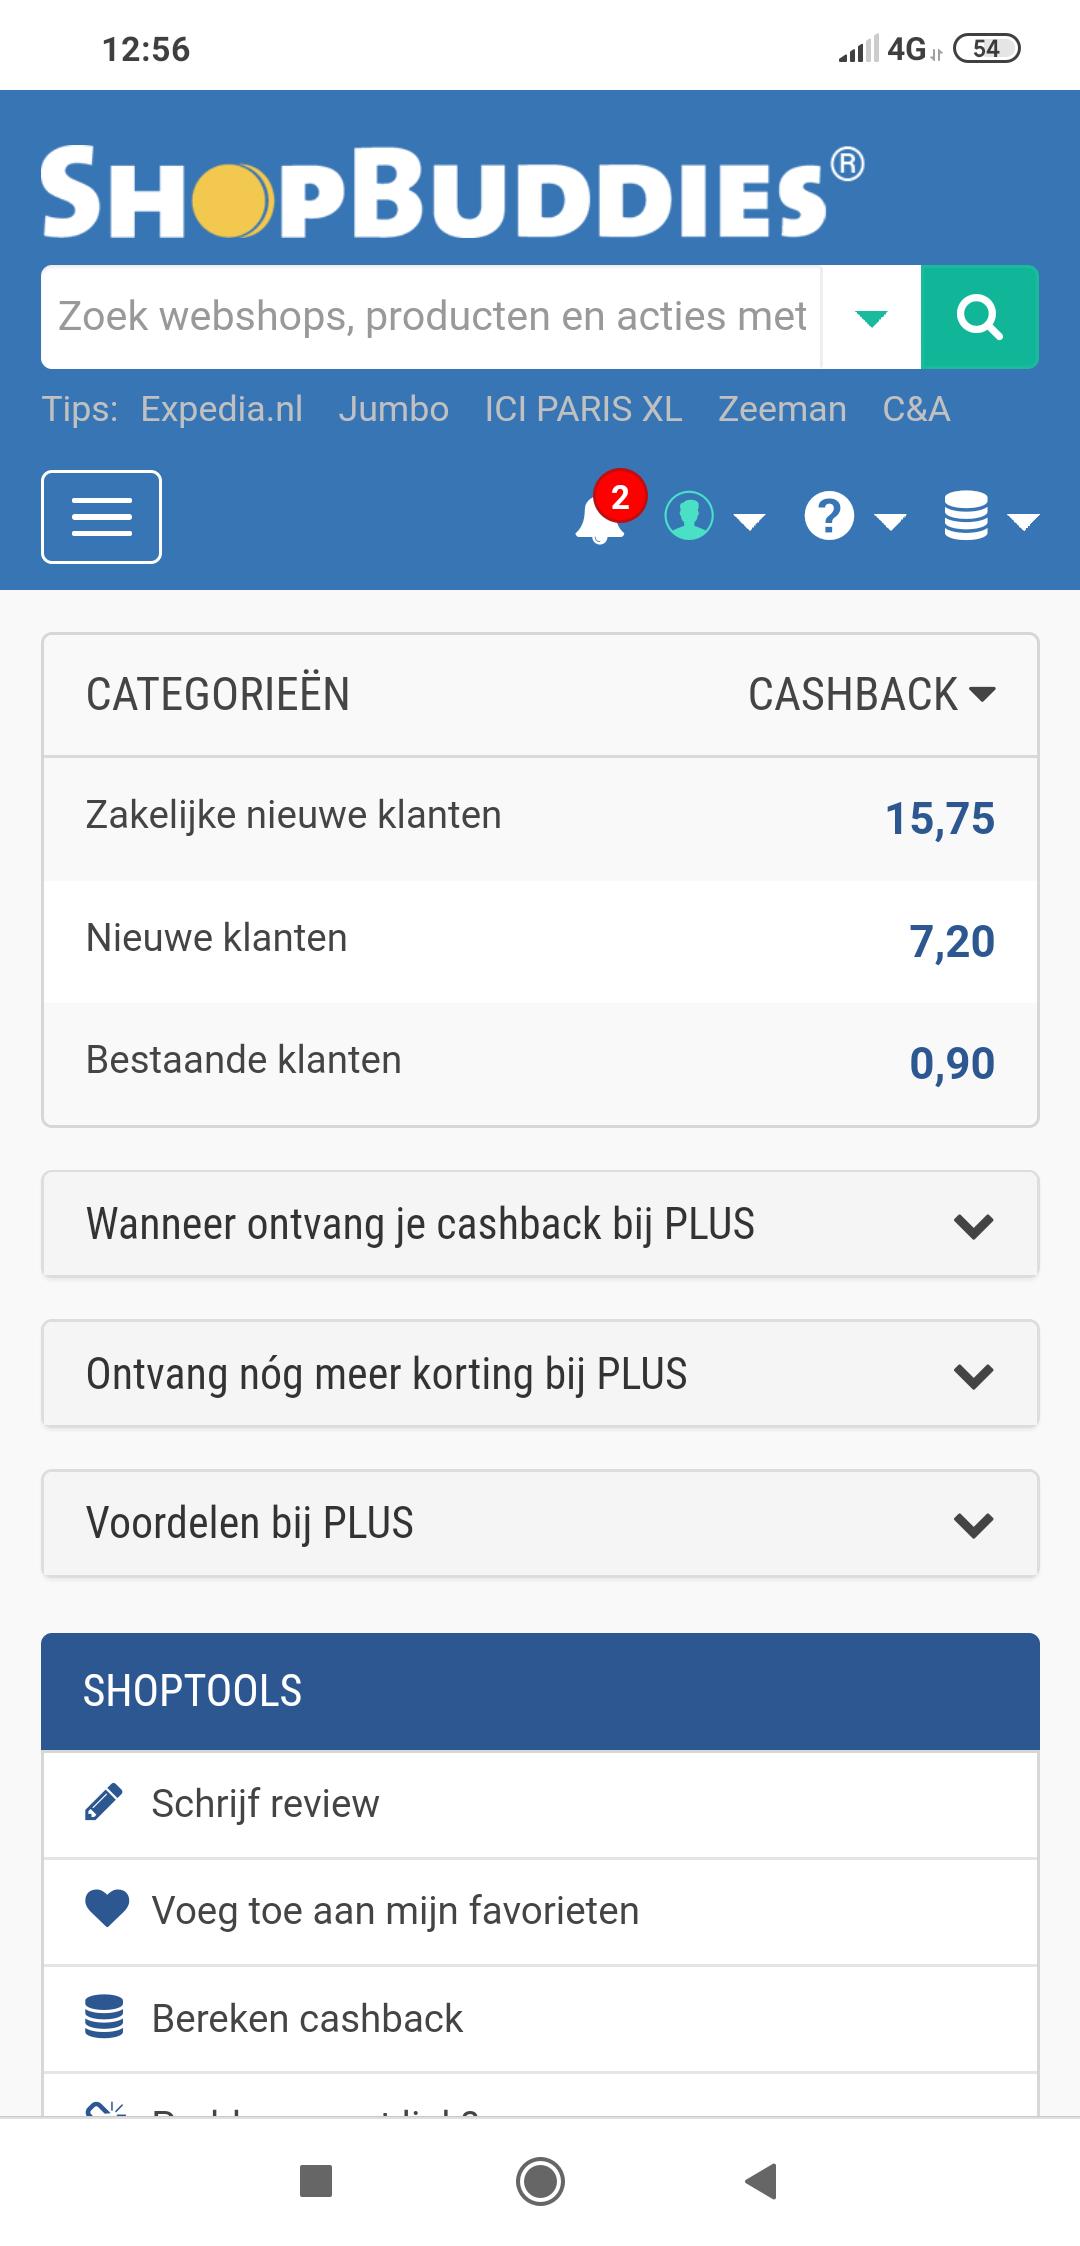 7,20 cashback bij PLUS (nieuwe klanten) @ShopBuddies